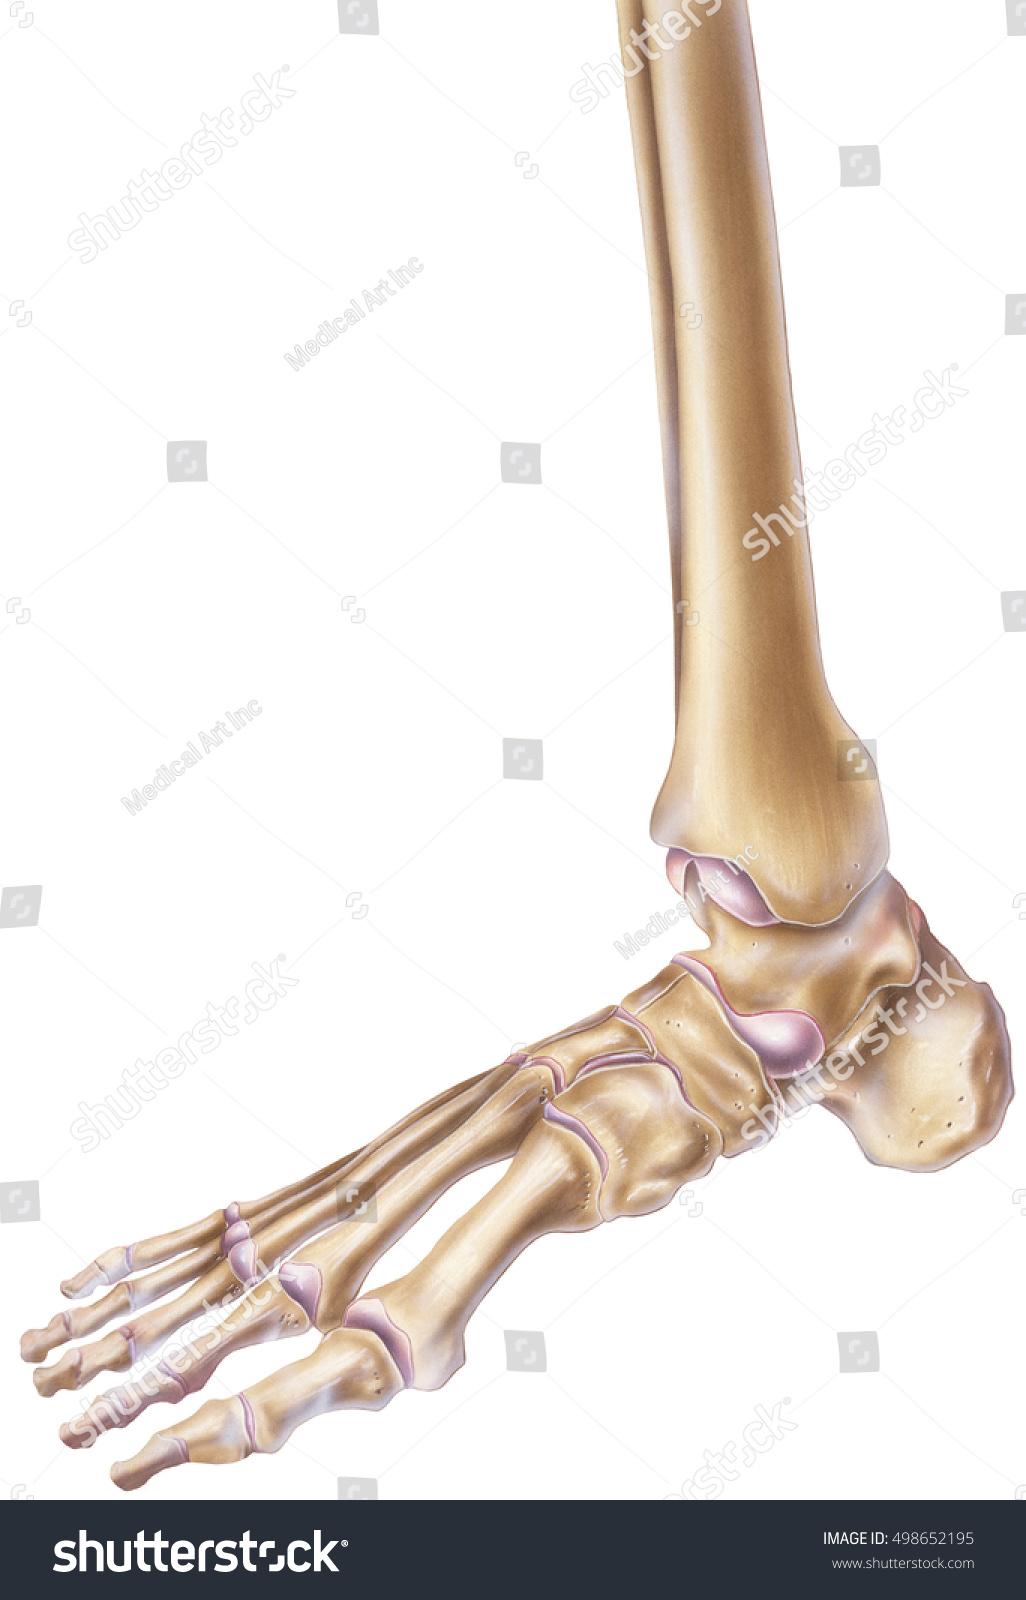 Foot Ankle Bones Joints Stock Illustration 498652195 Shutterstock